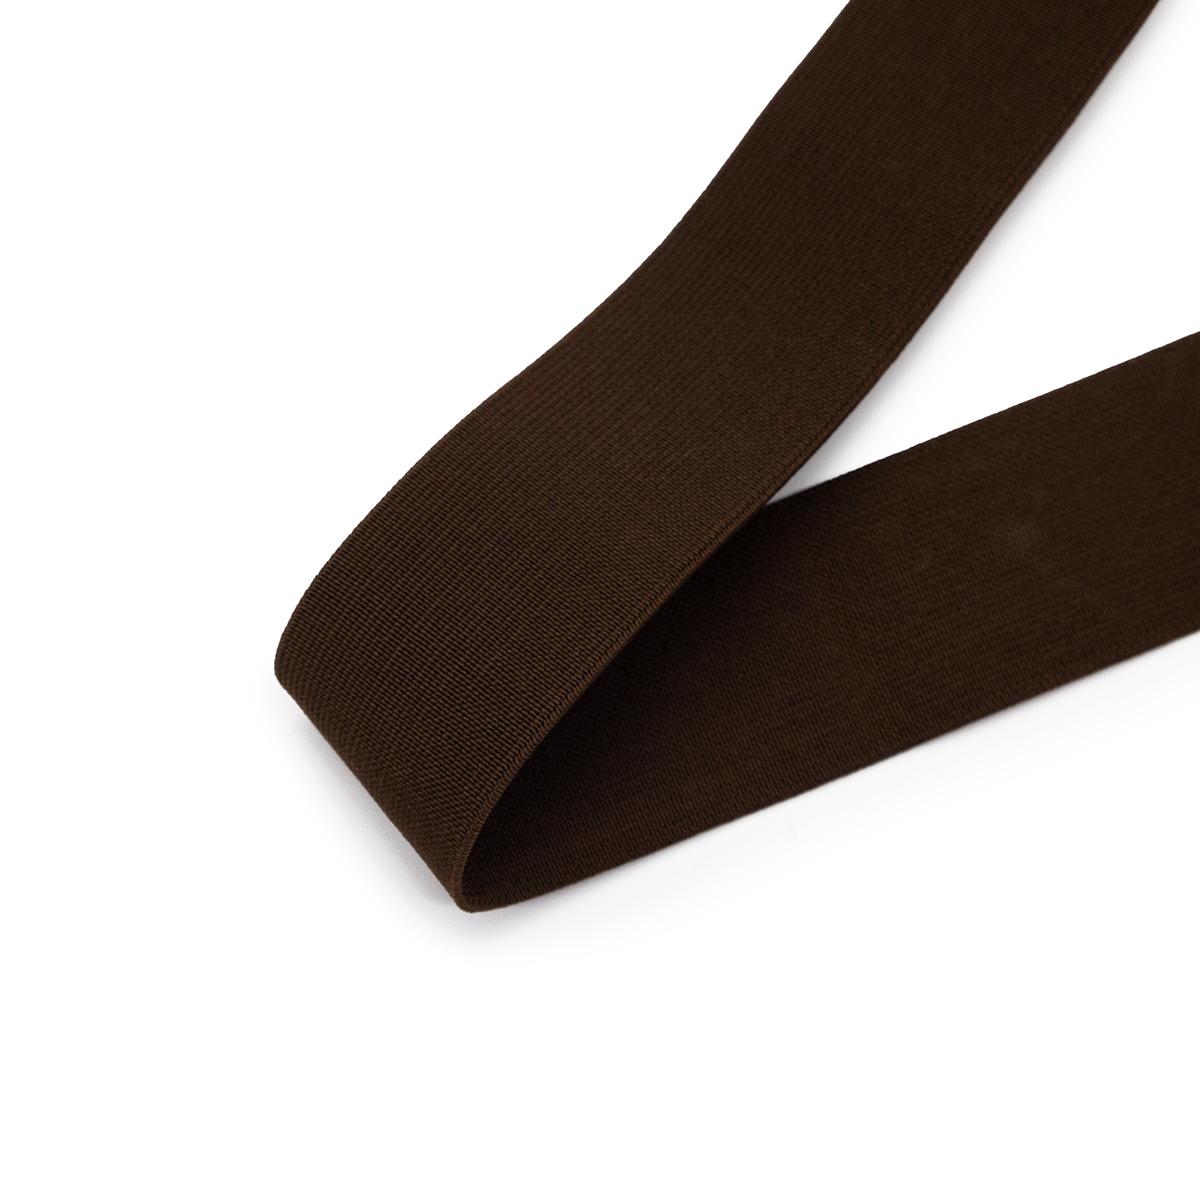 15-3850/9707 Резинка вязаная 40мм*25м т.коричневый ГР